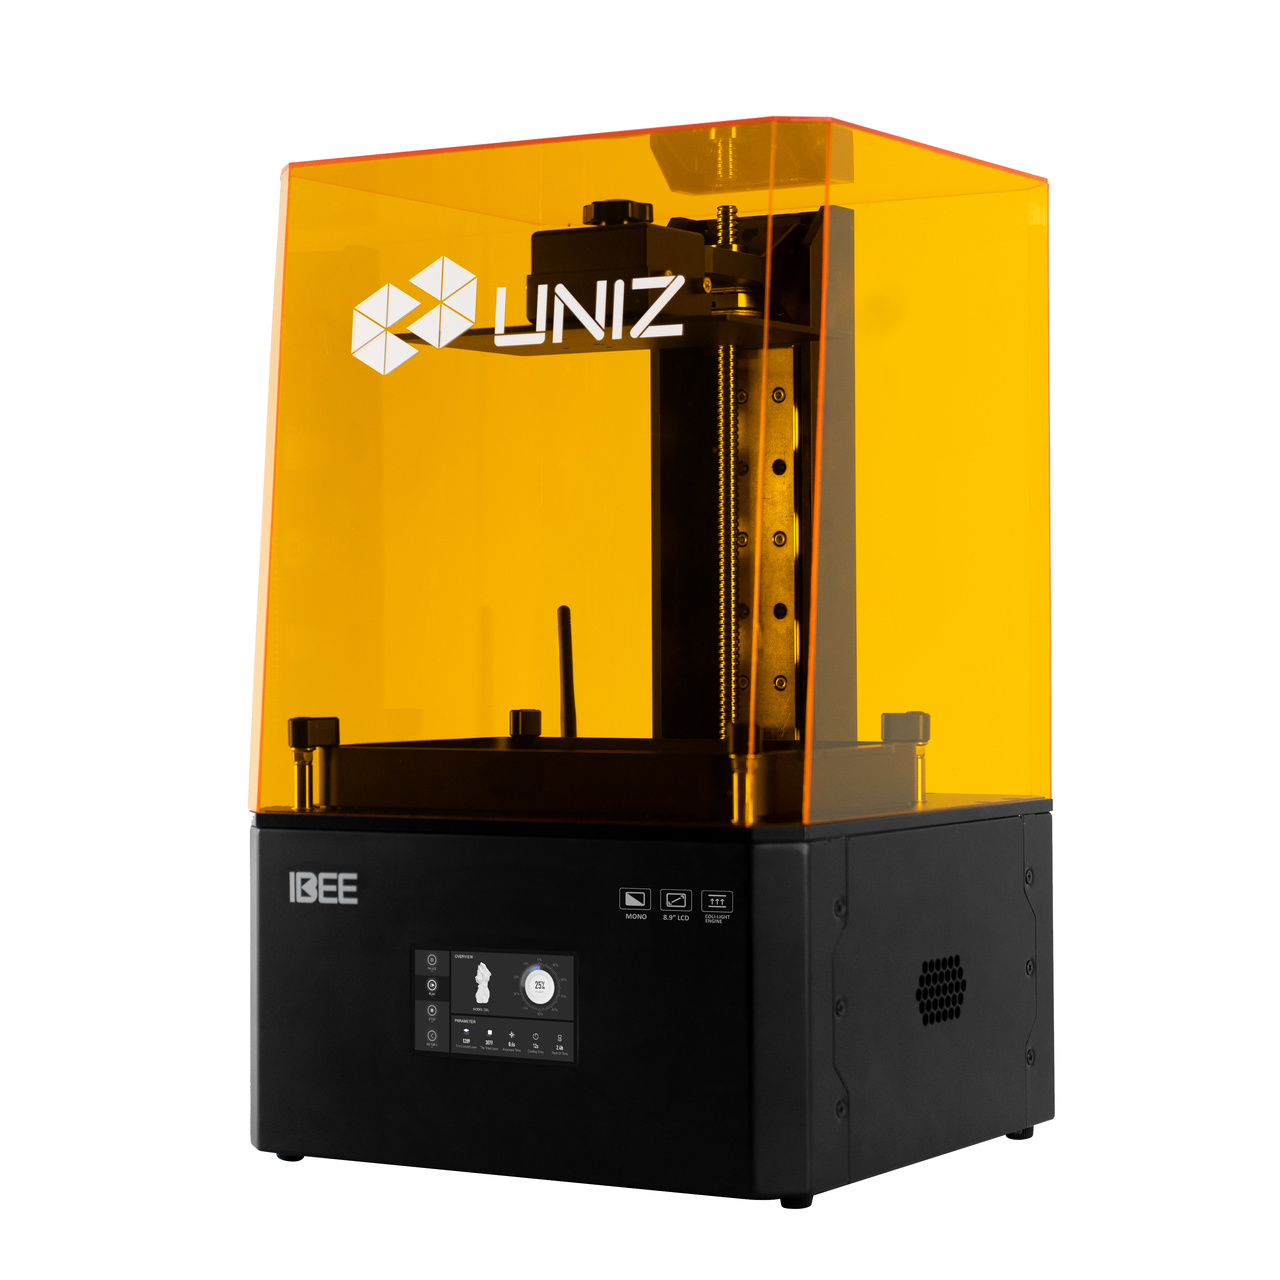 Impressora 3D de Resina - Uniz IBEE - 3D Touch